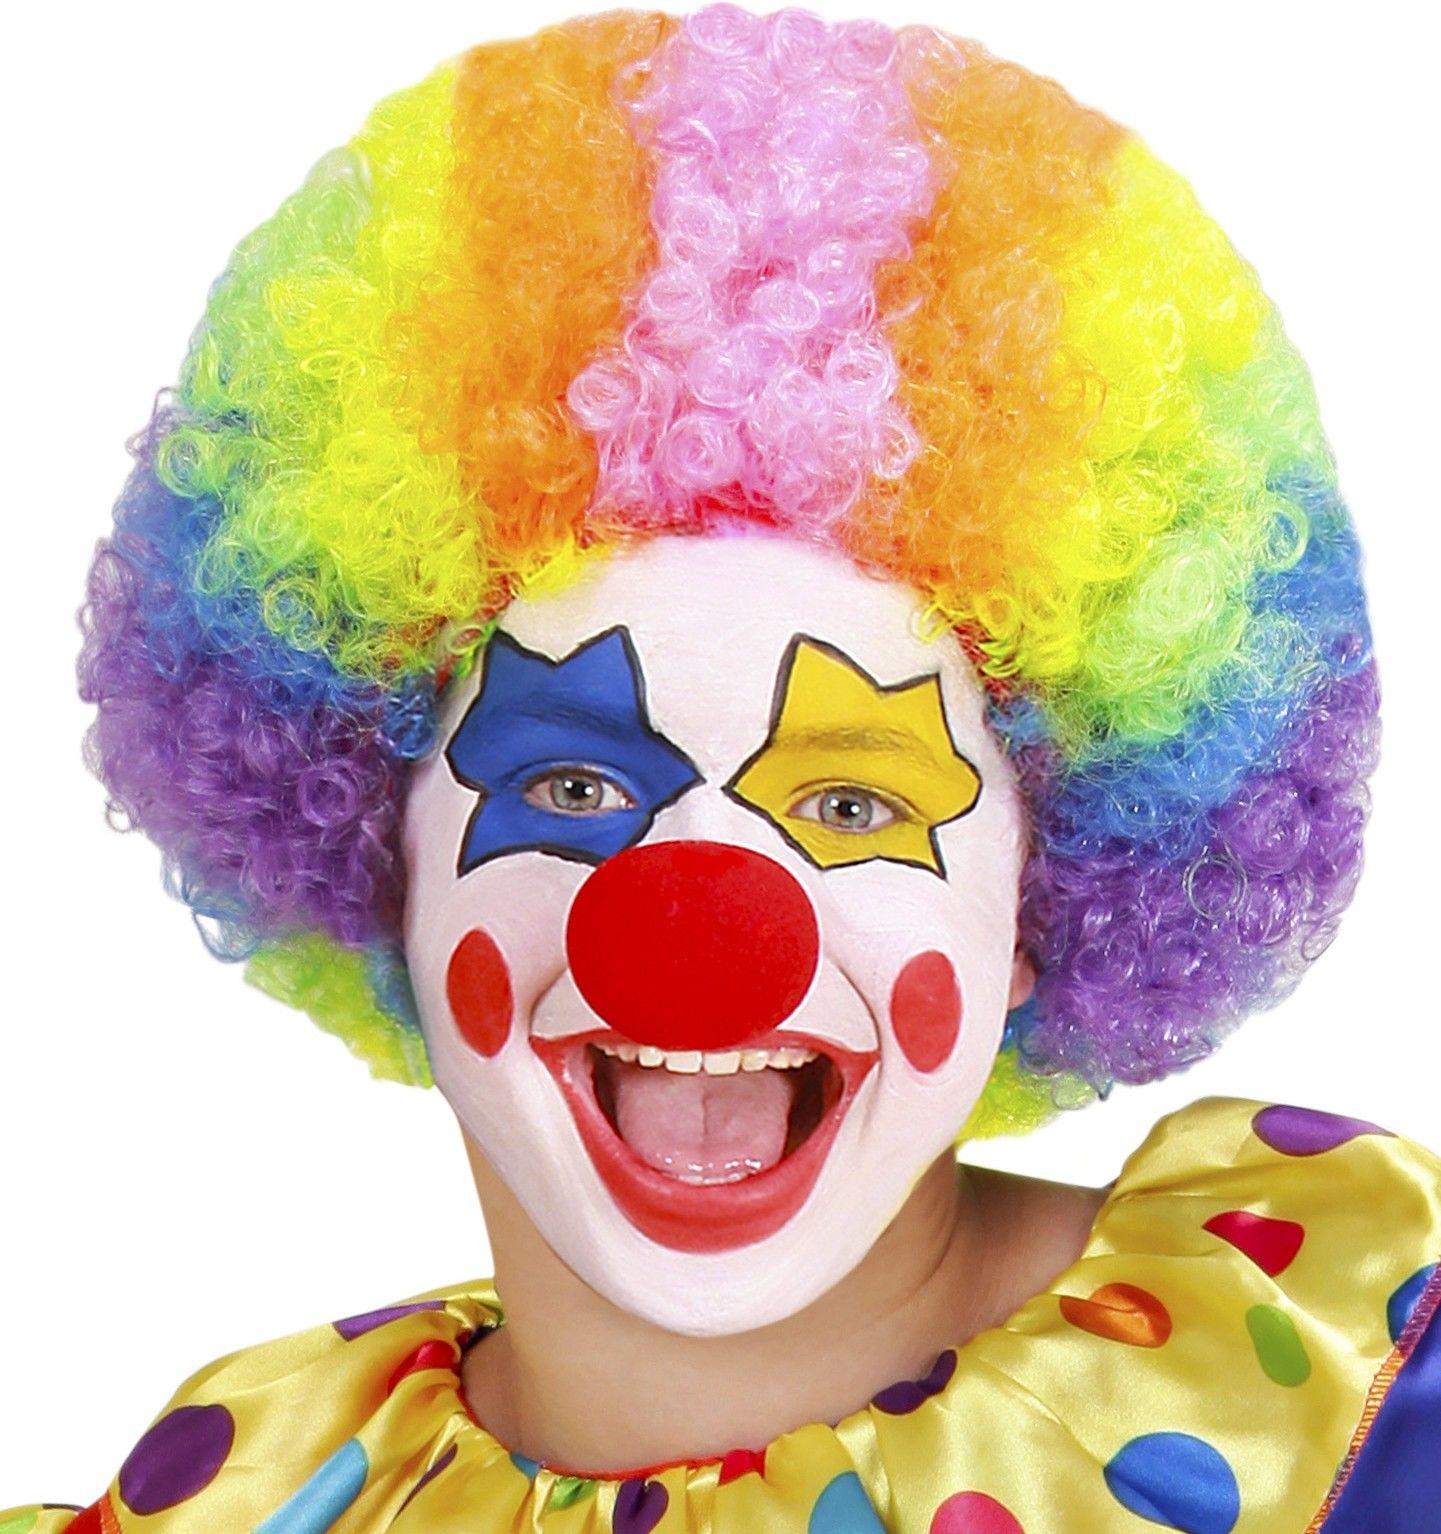 картинки грима клоуна согласен